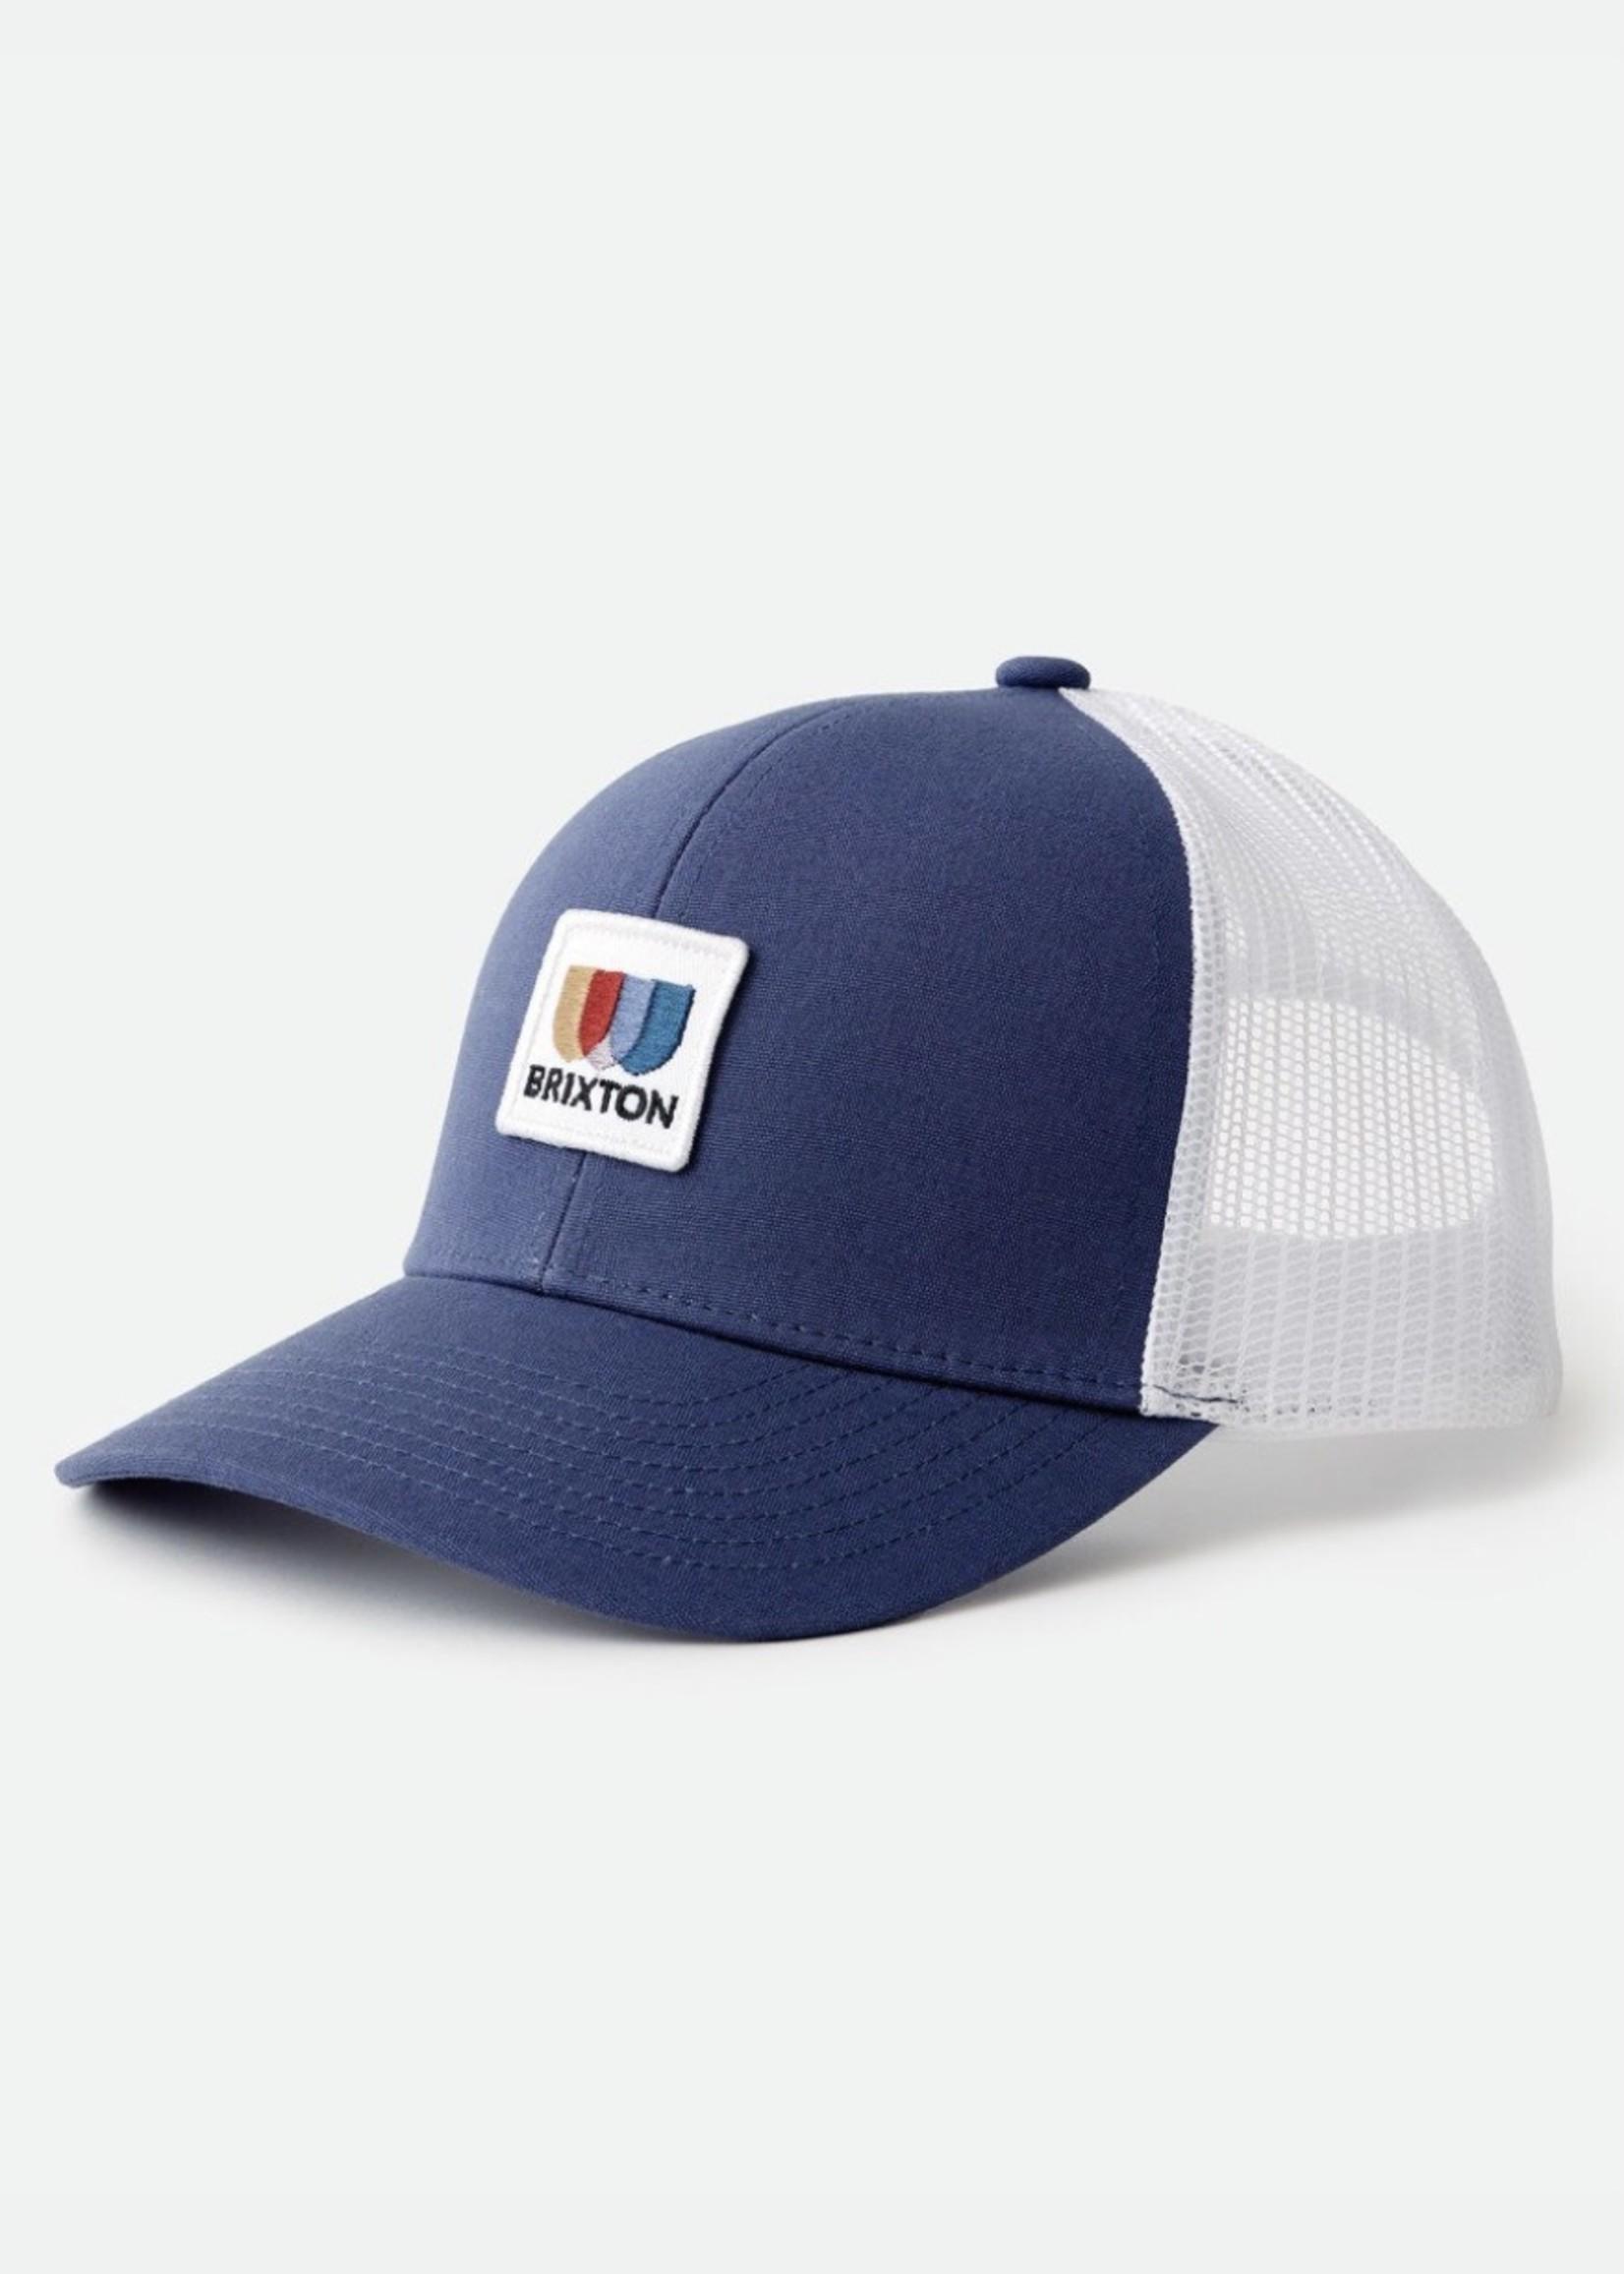 BRIXTON Alton Mesh Cap BLUE/WHITE